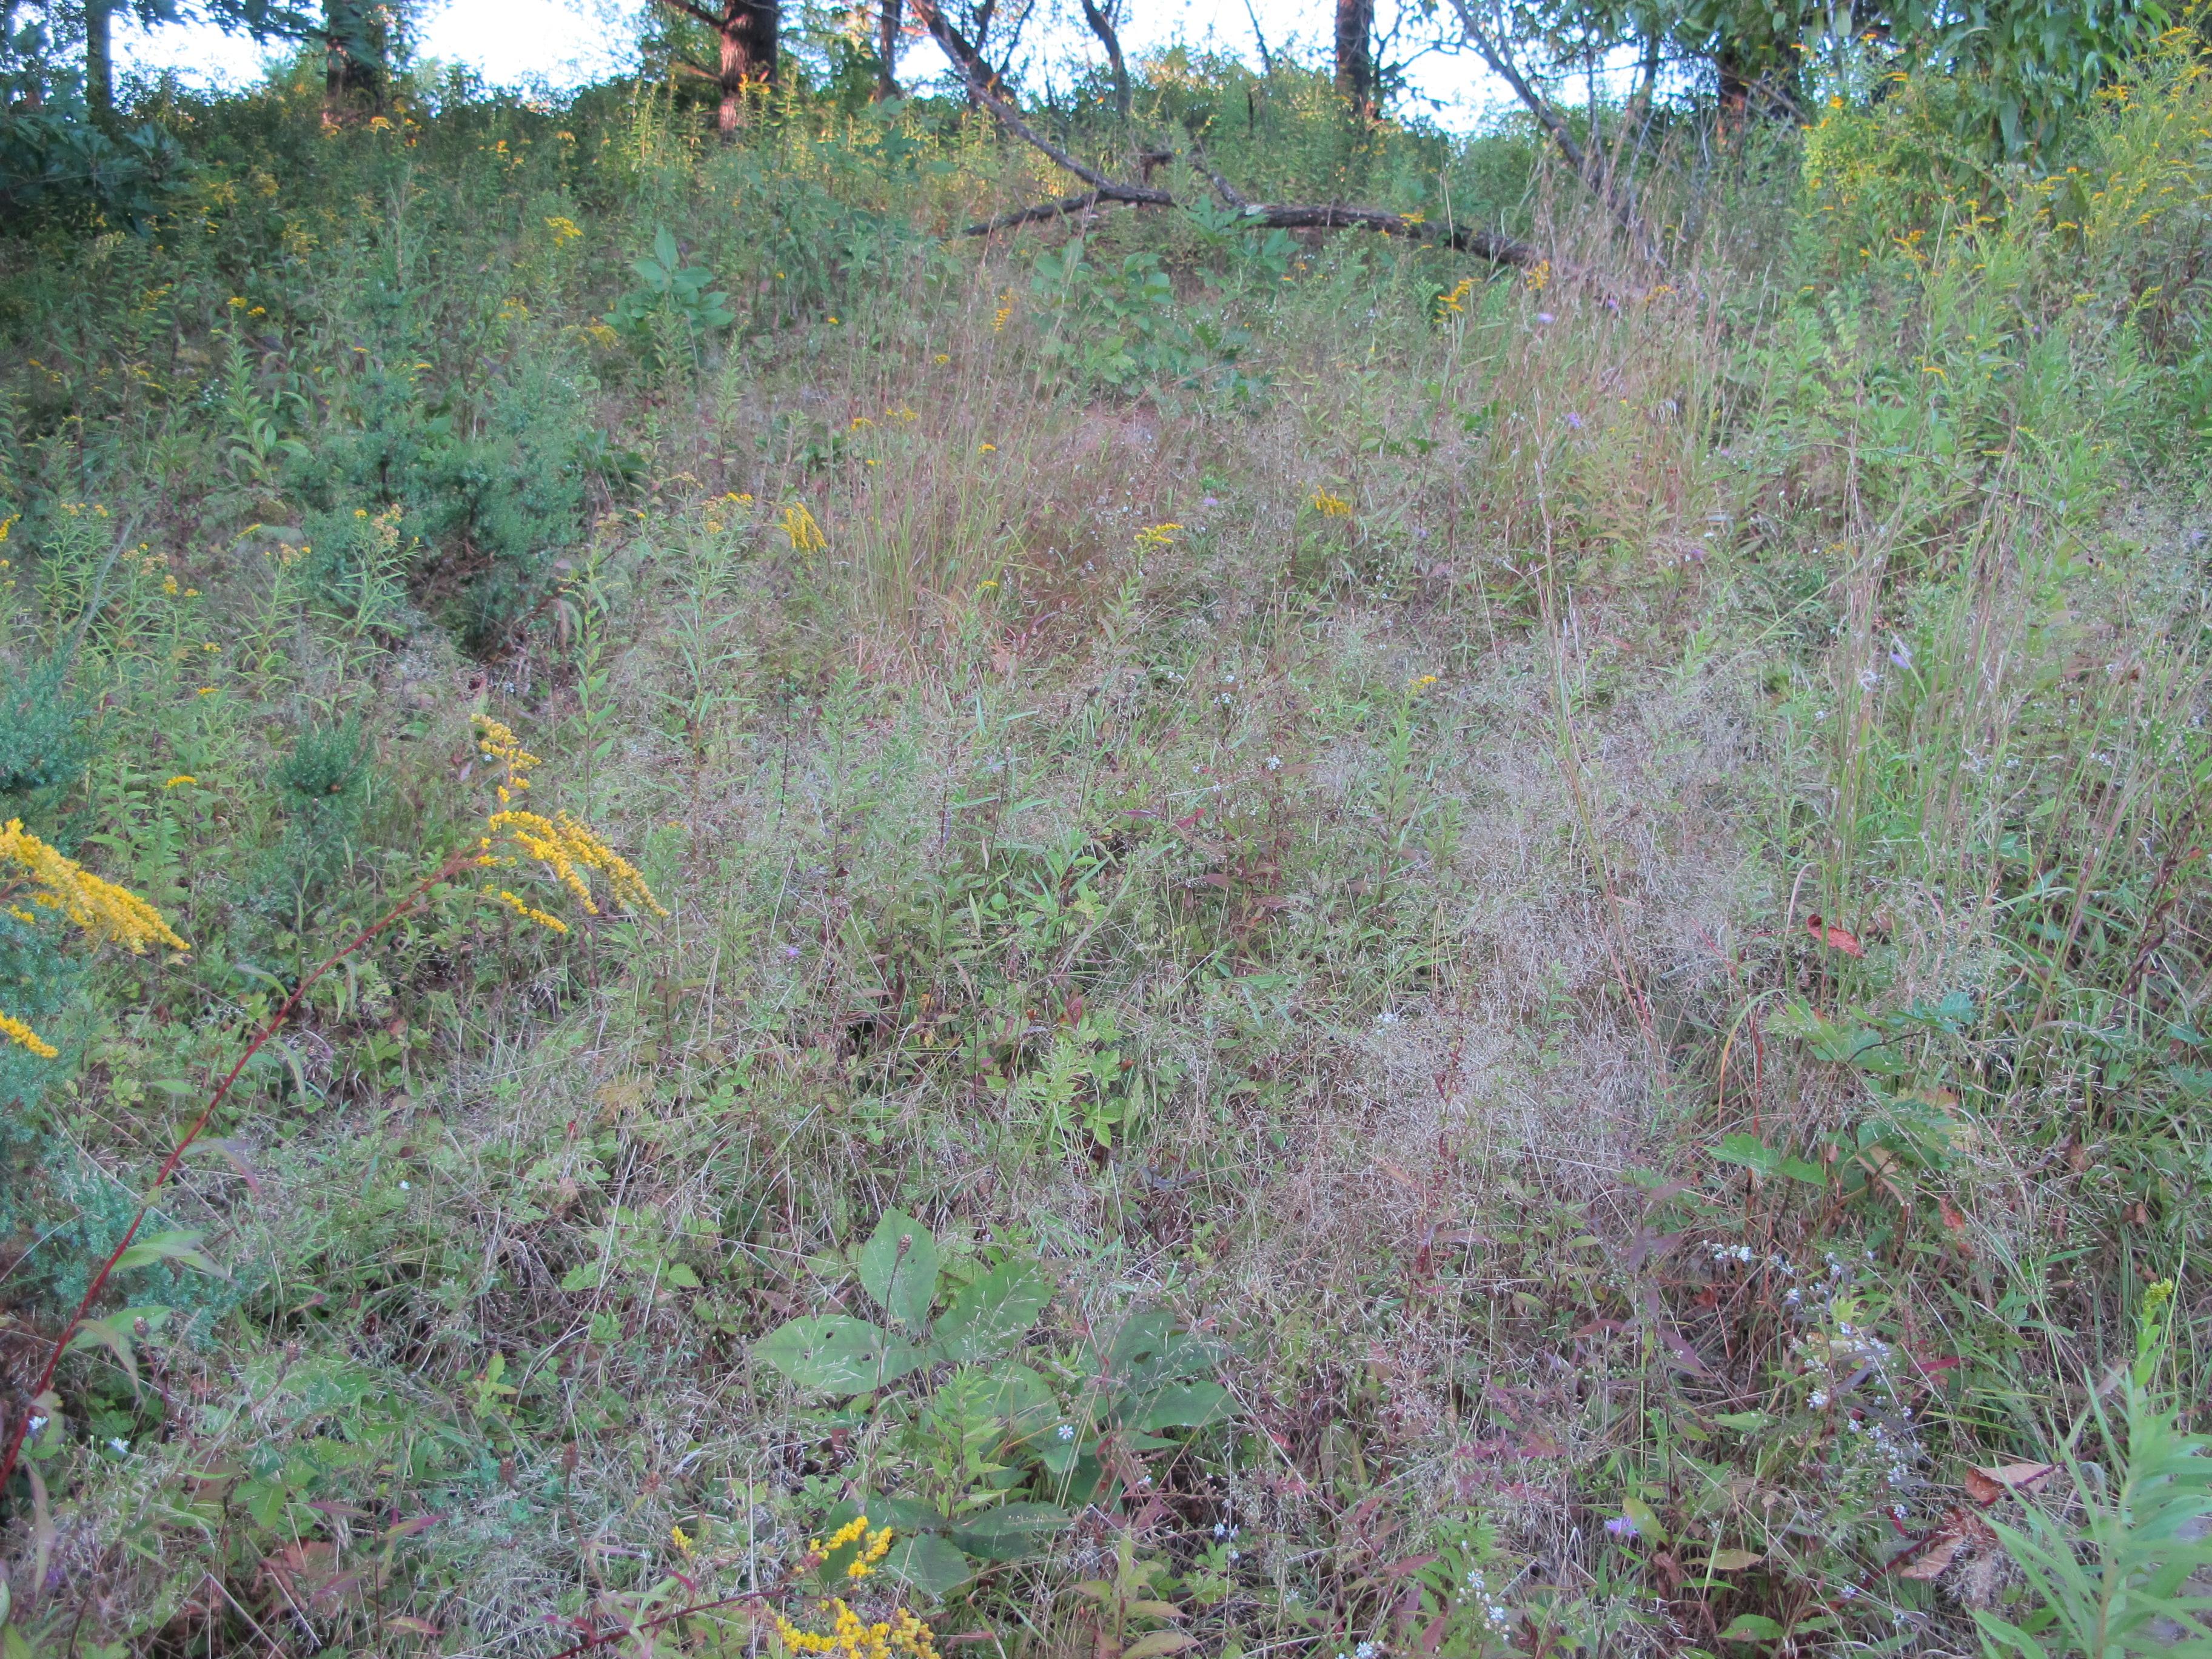 dry hillside covered in grasses and goldenrod